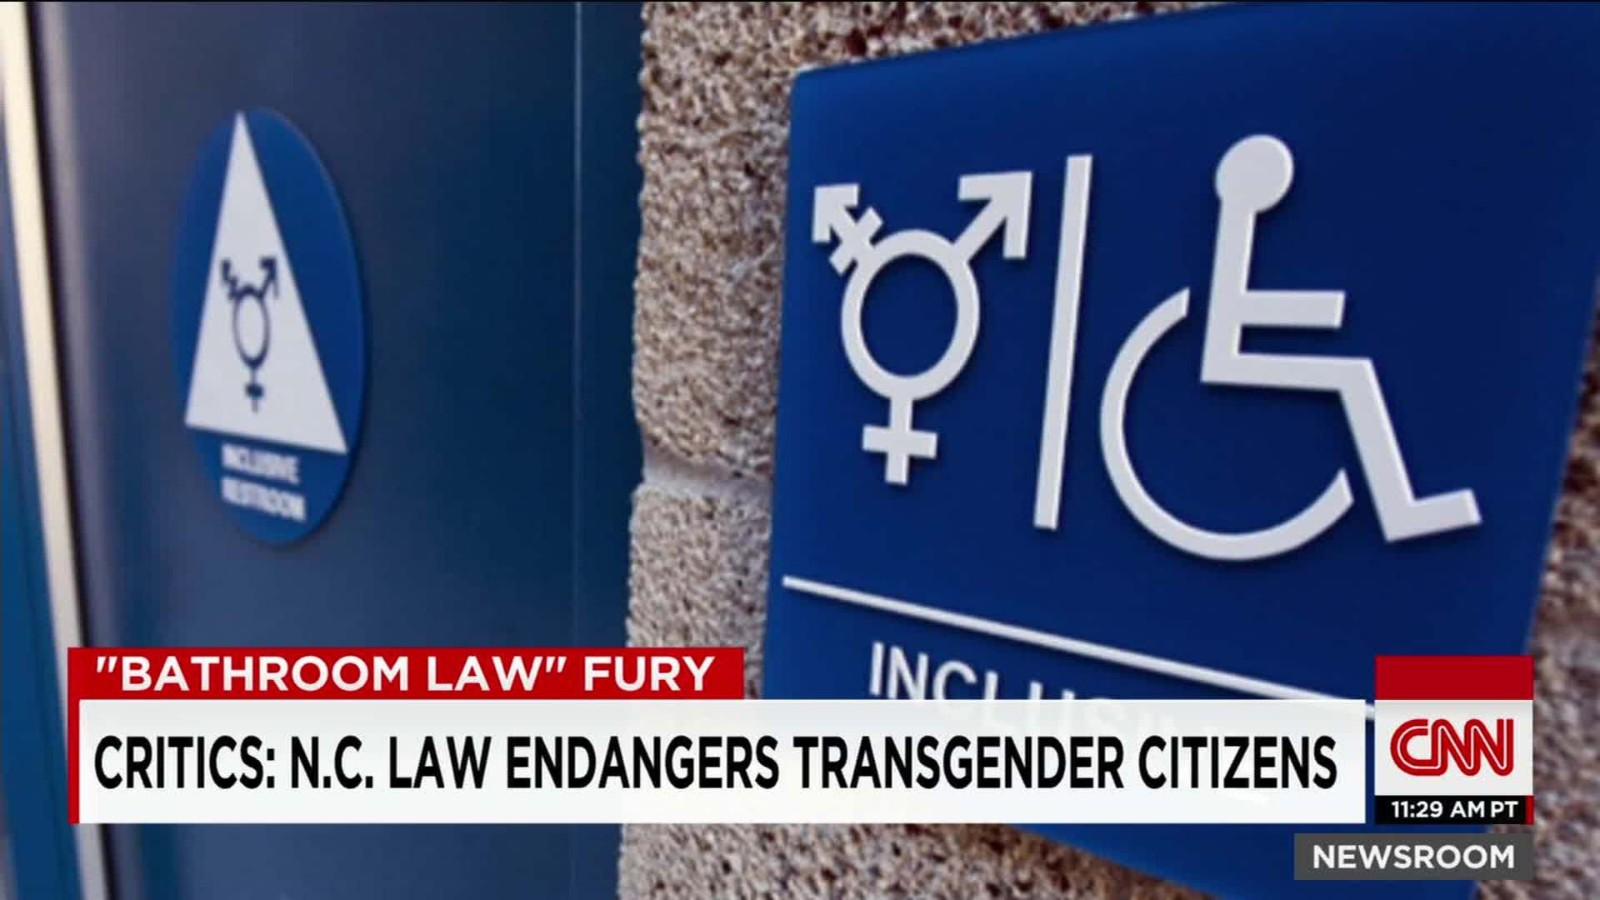 Trumps reversal on transgender bathroom directive How we got